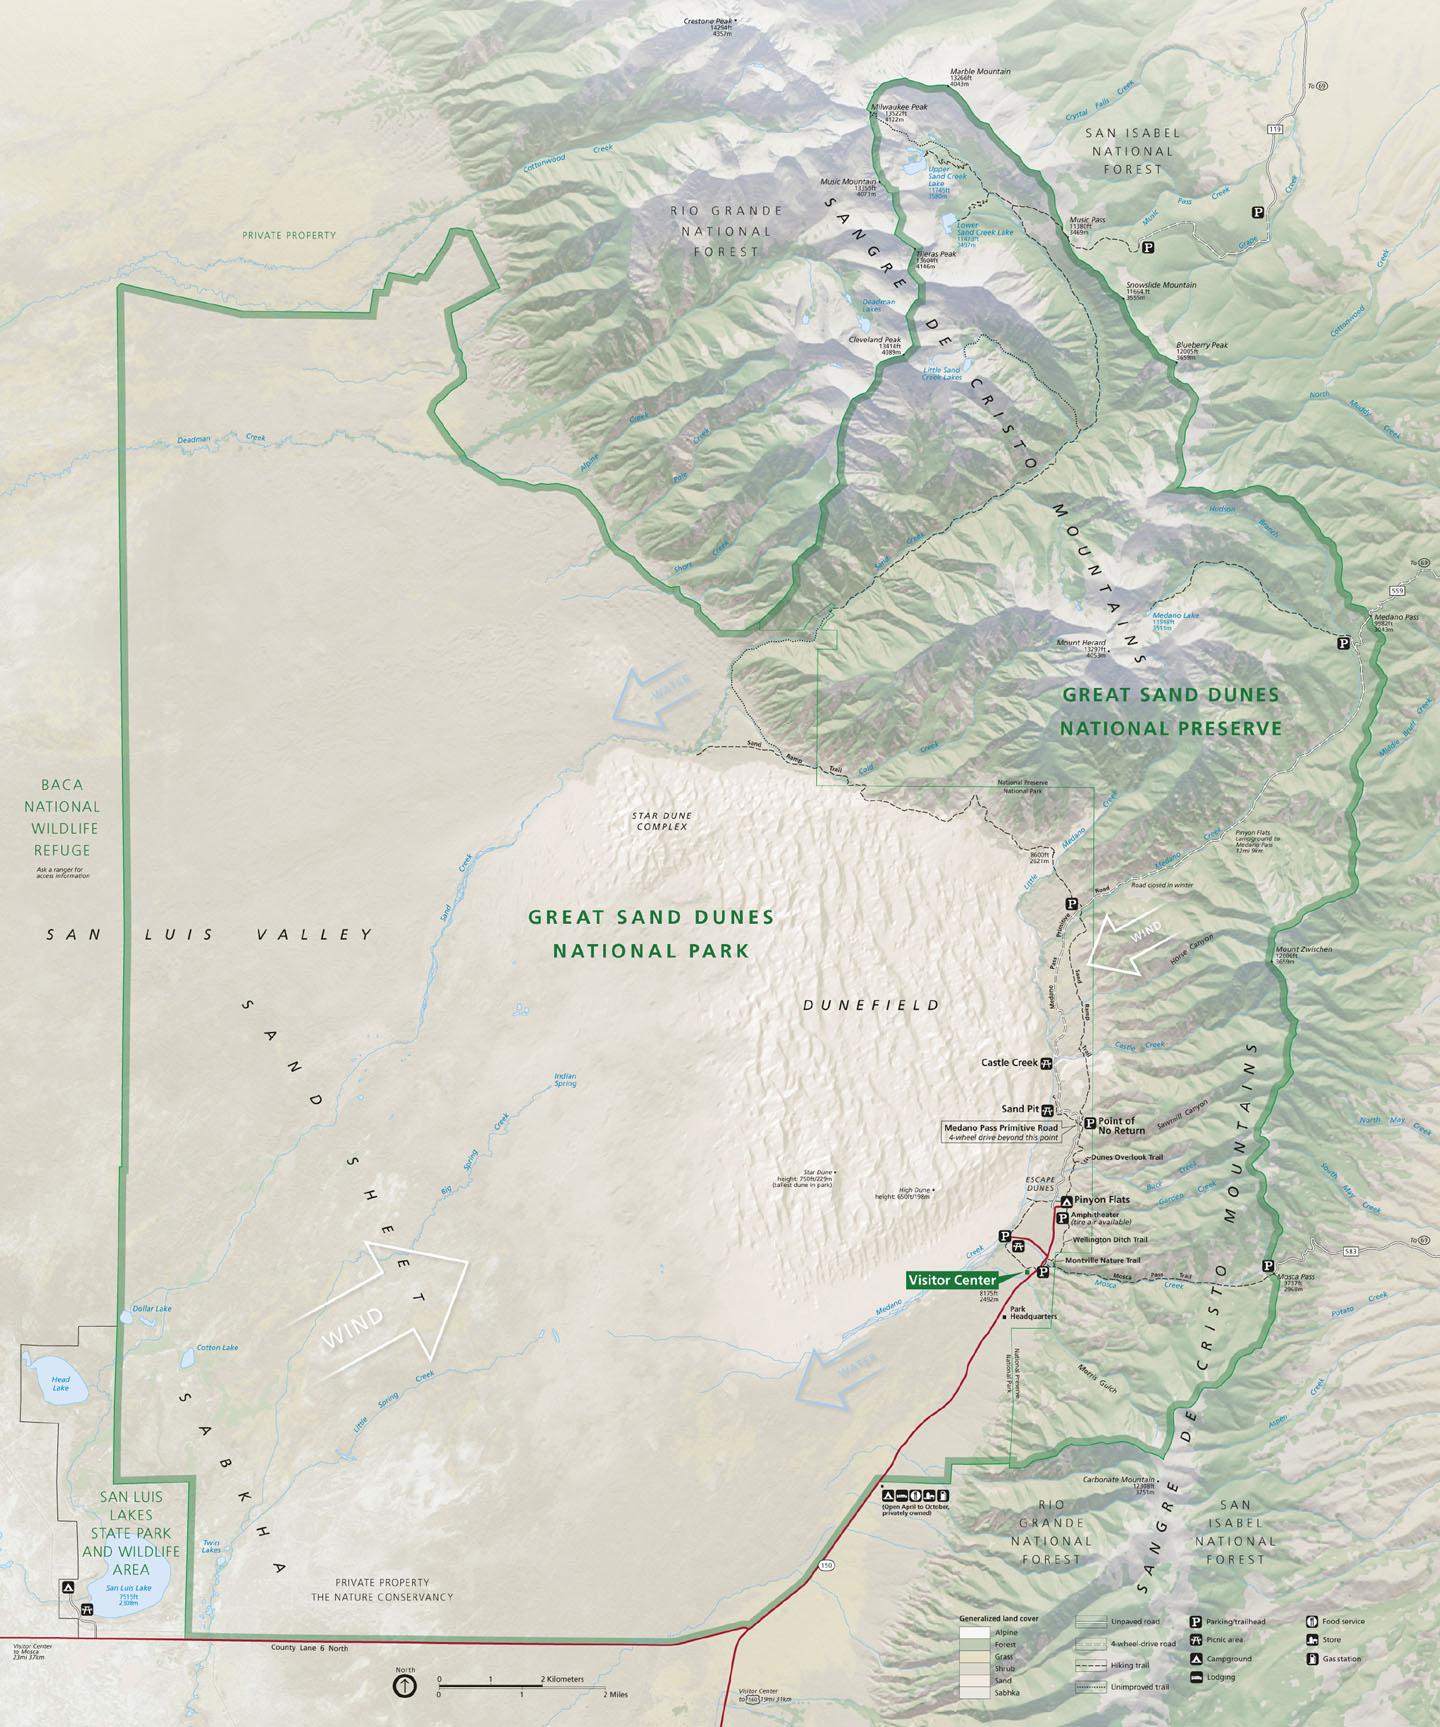 Great Sand Dunes National Park & Preserve | Colorado\'s Wild Areas